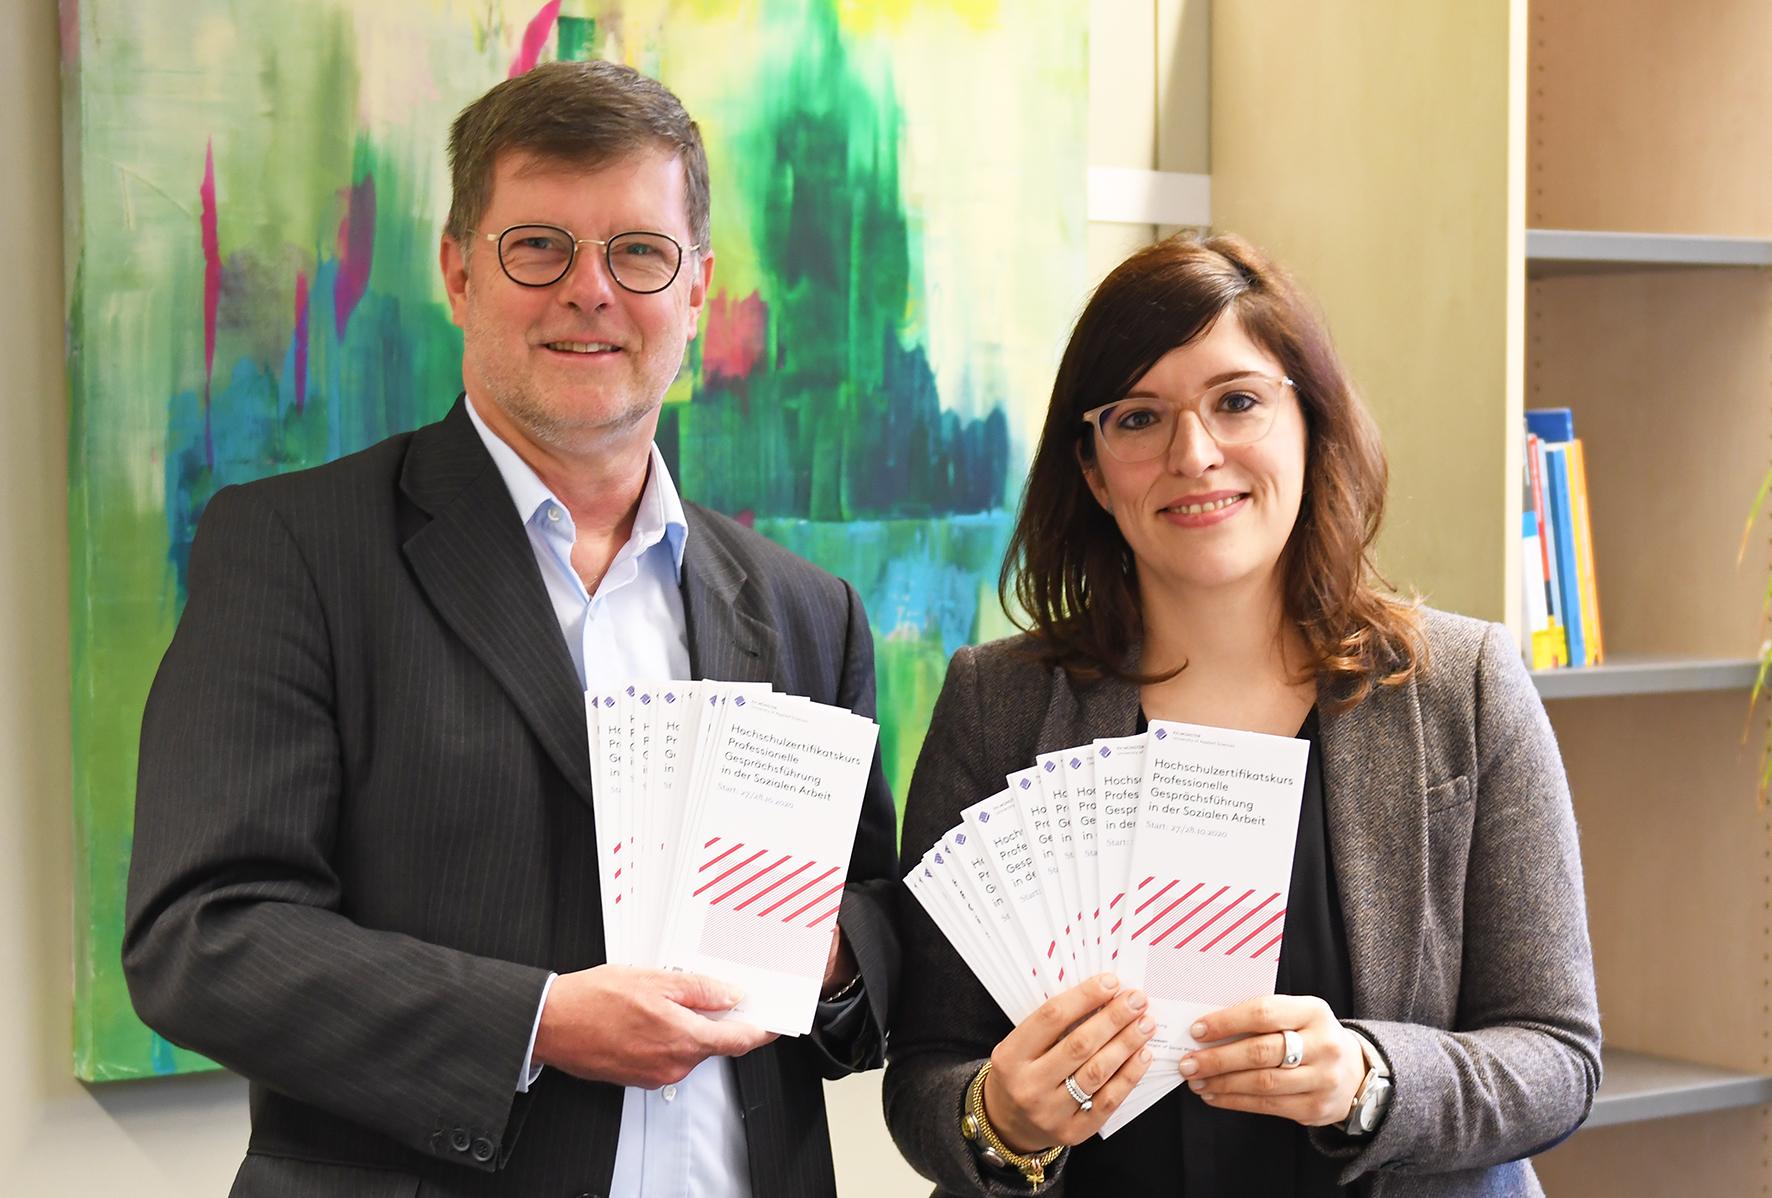 Prof. Dr. Stephan Barth und Dr. Laura Best